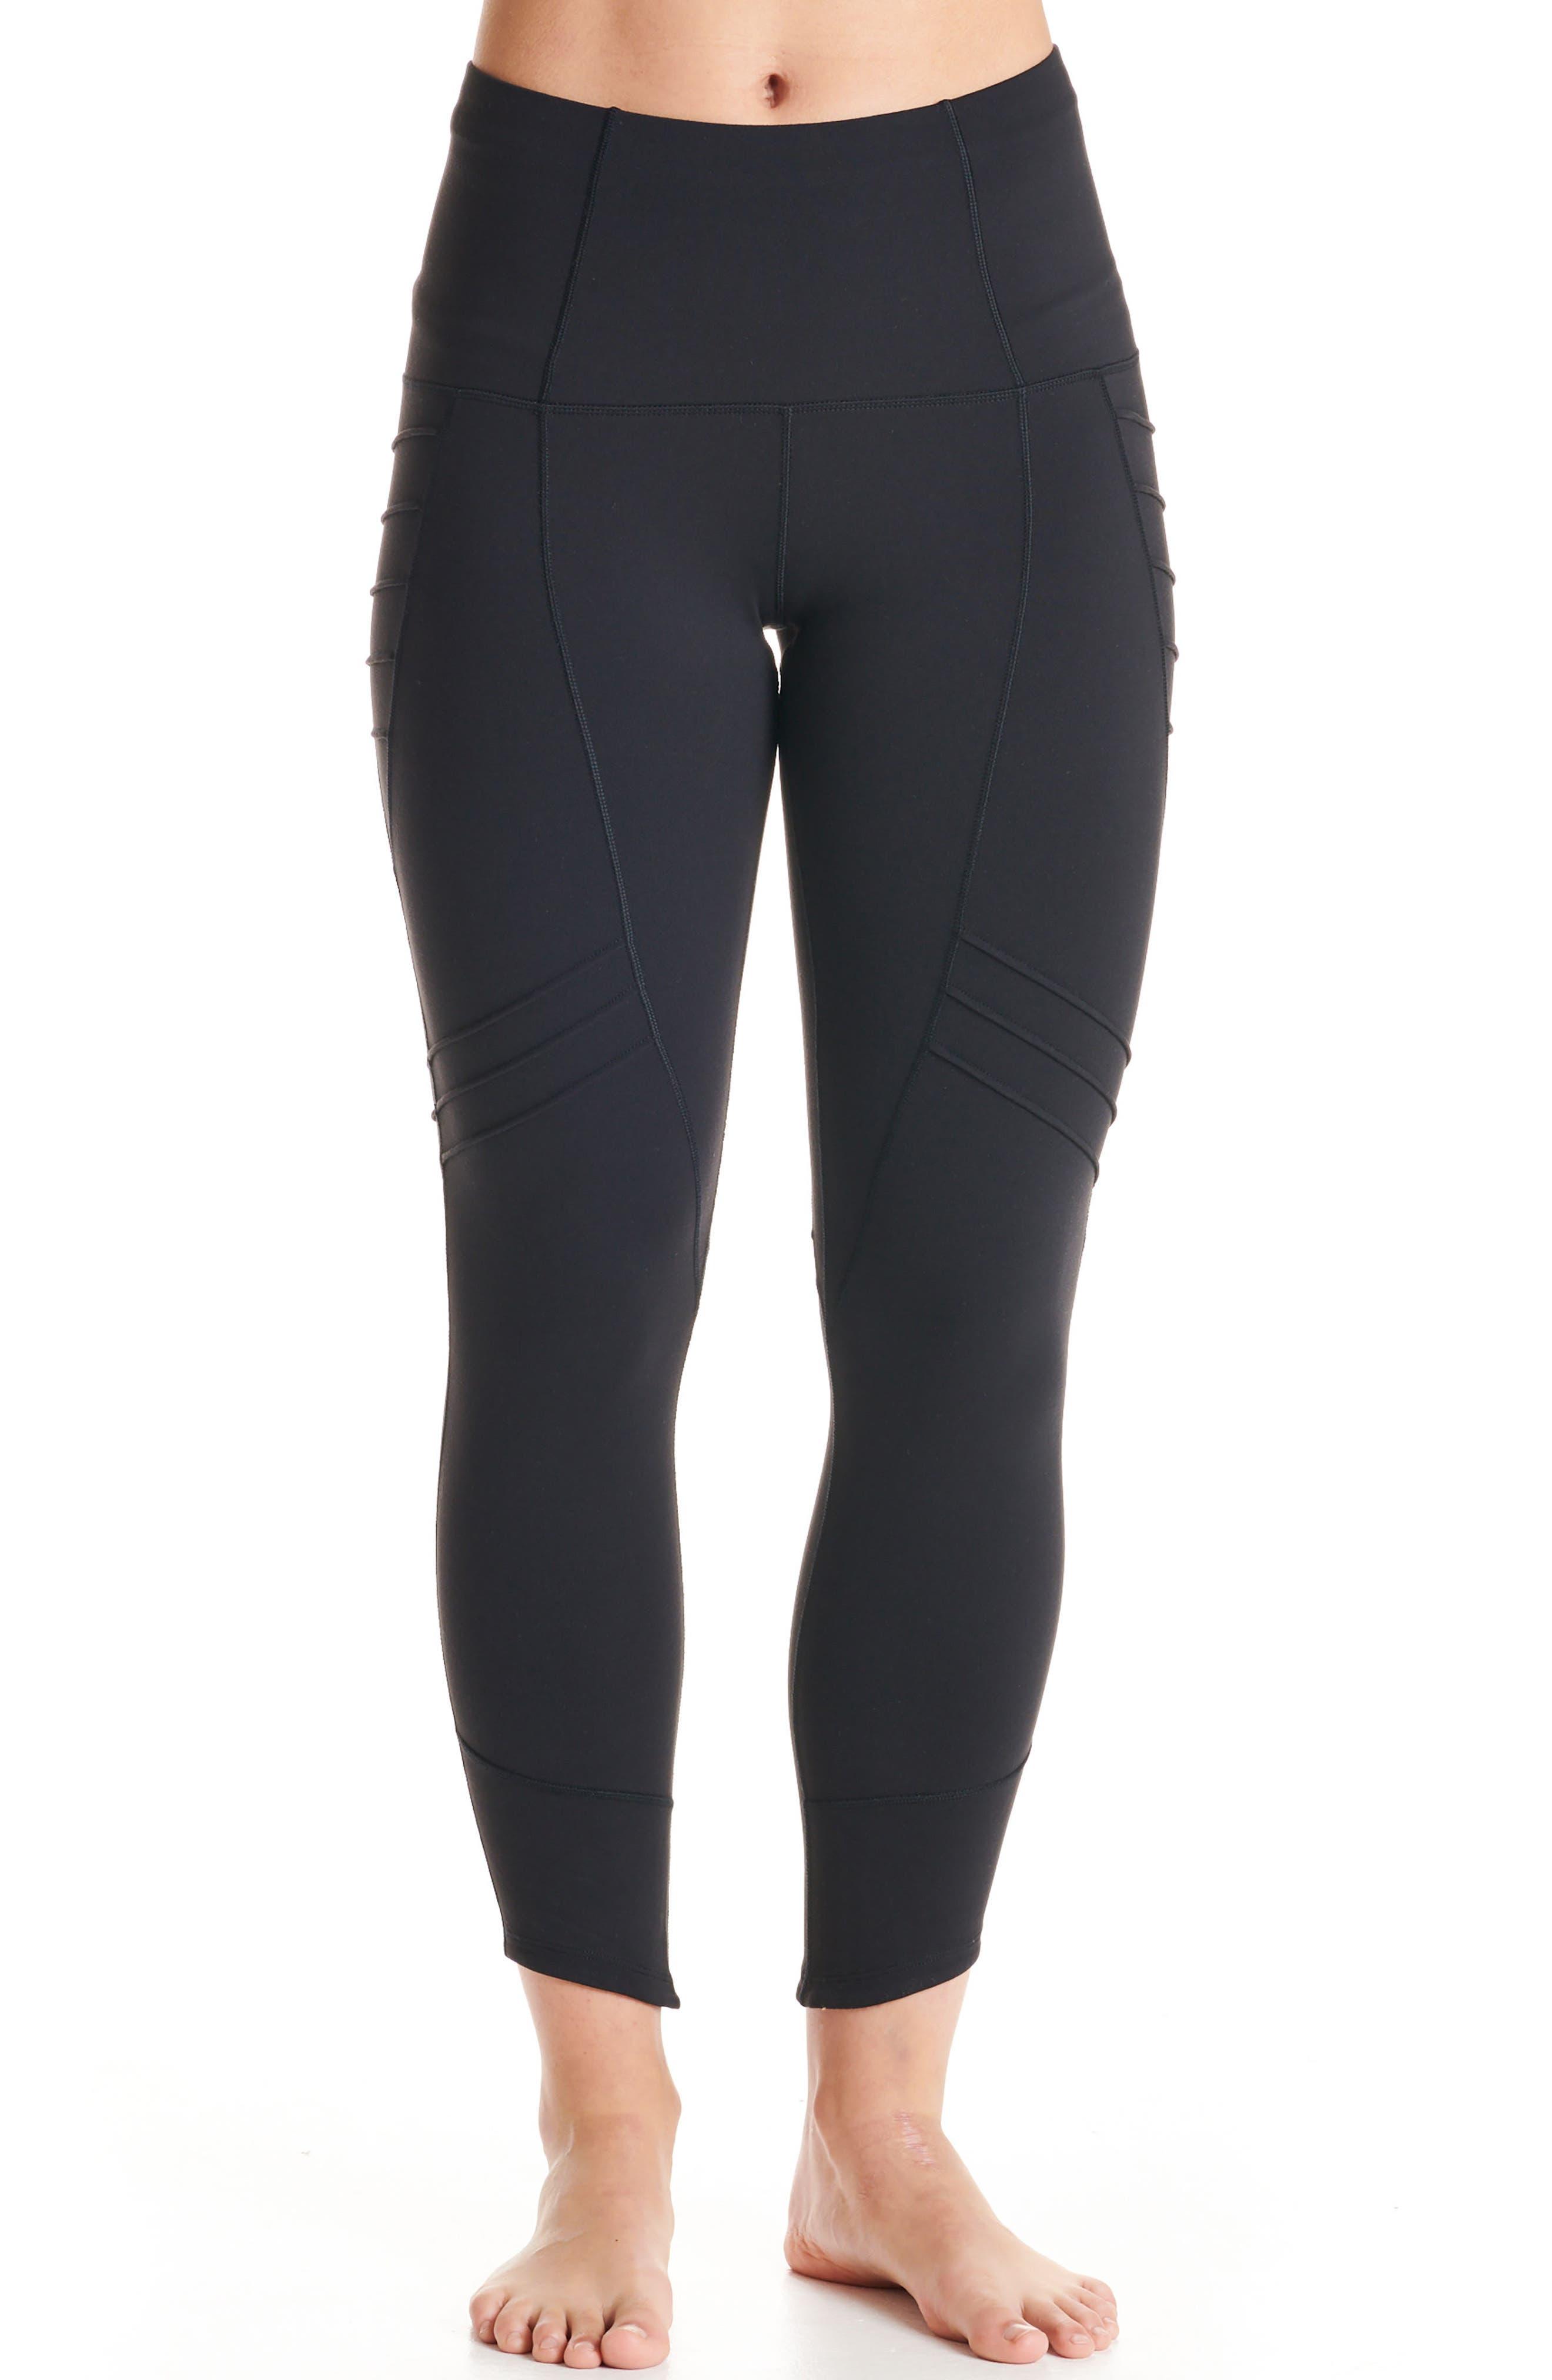 Aero Leggings,                         Main,                         color, BLACK